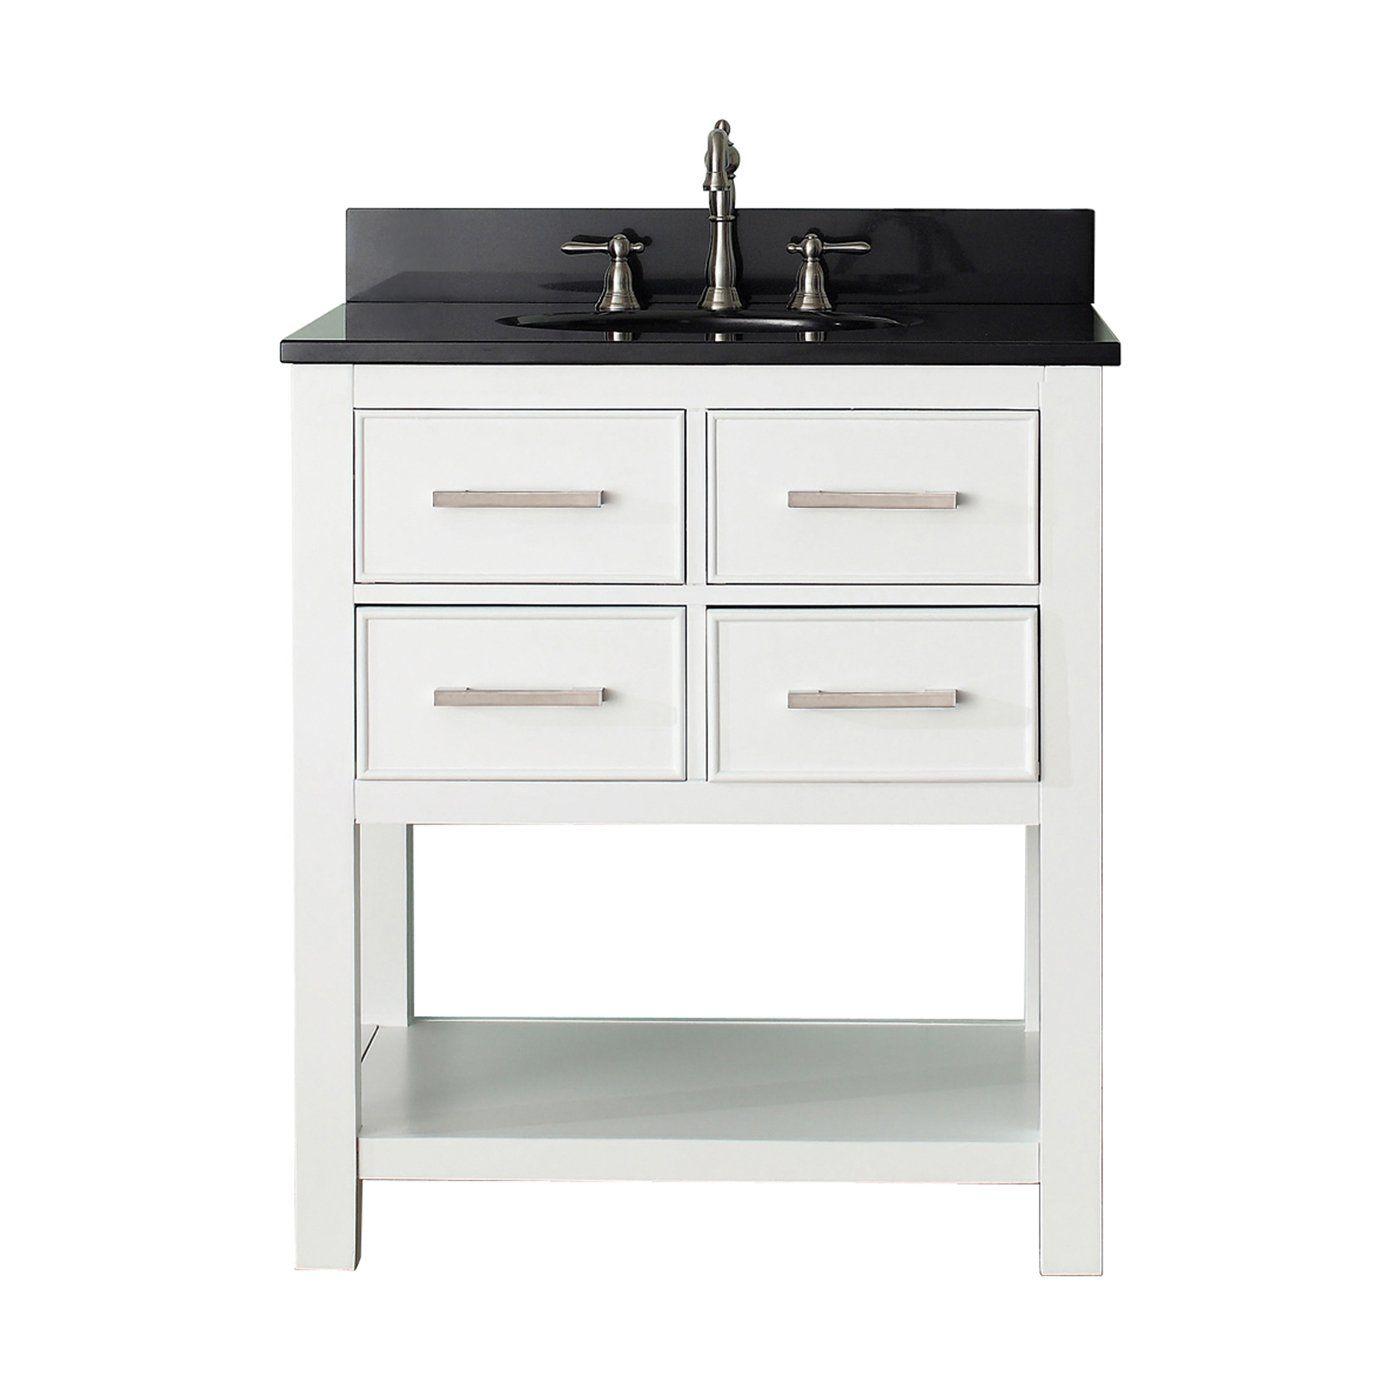 Shop Avanity BROOKS-VS Brooks Bathroom Vanity Combo at Lowe\'s Canada ...